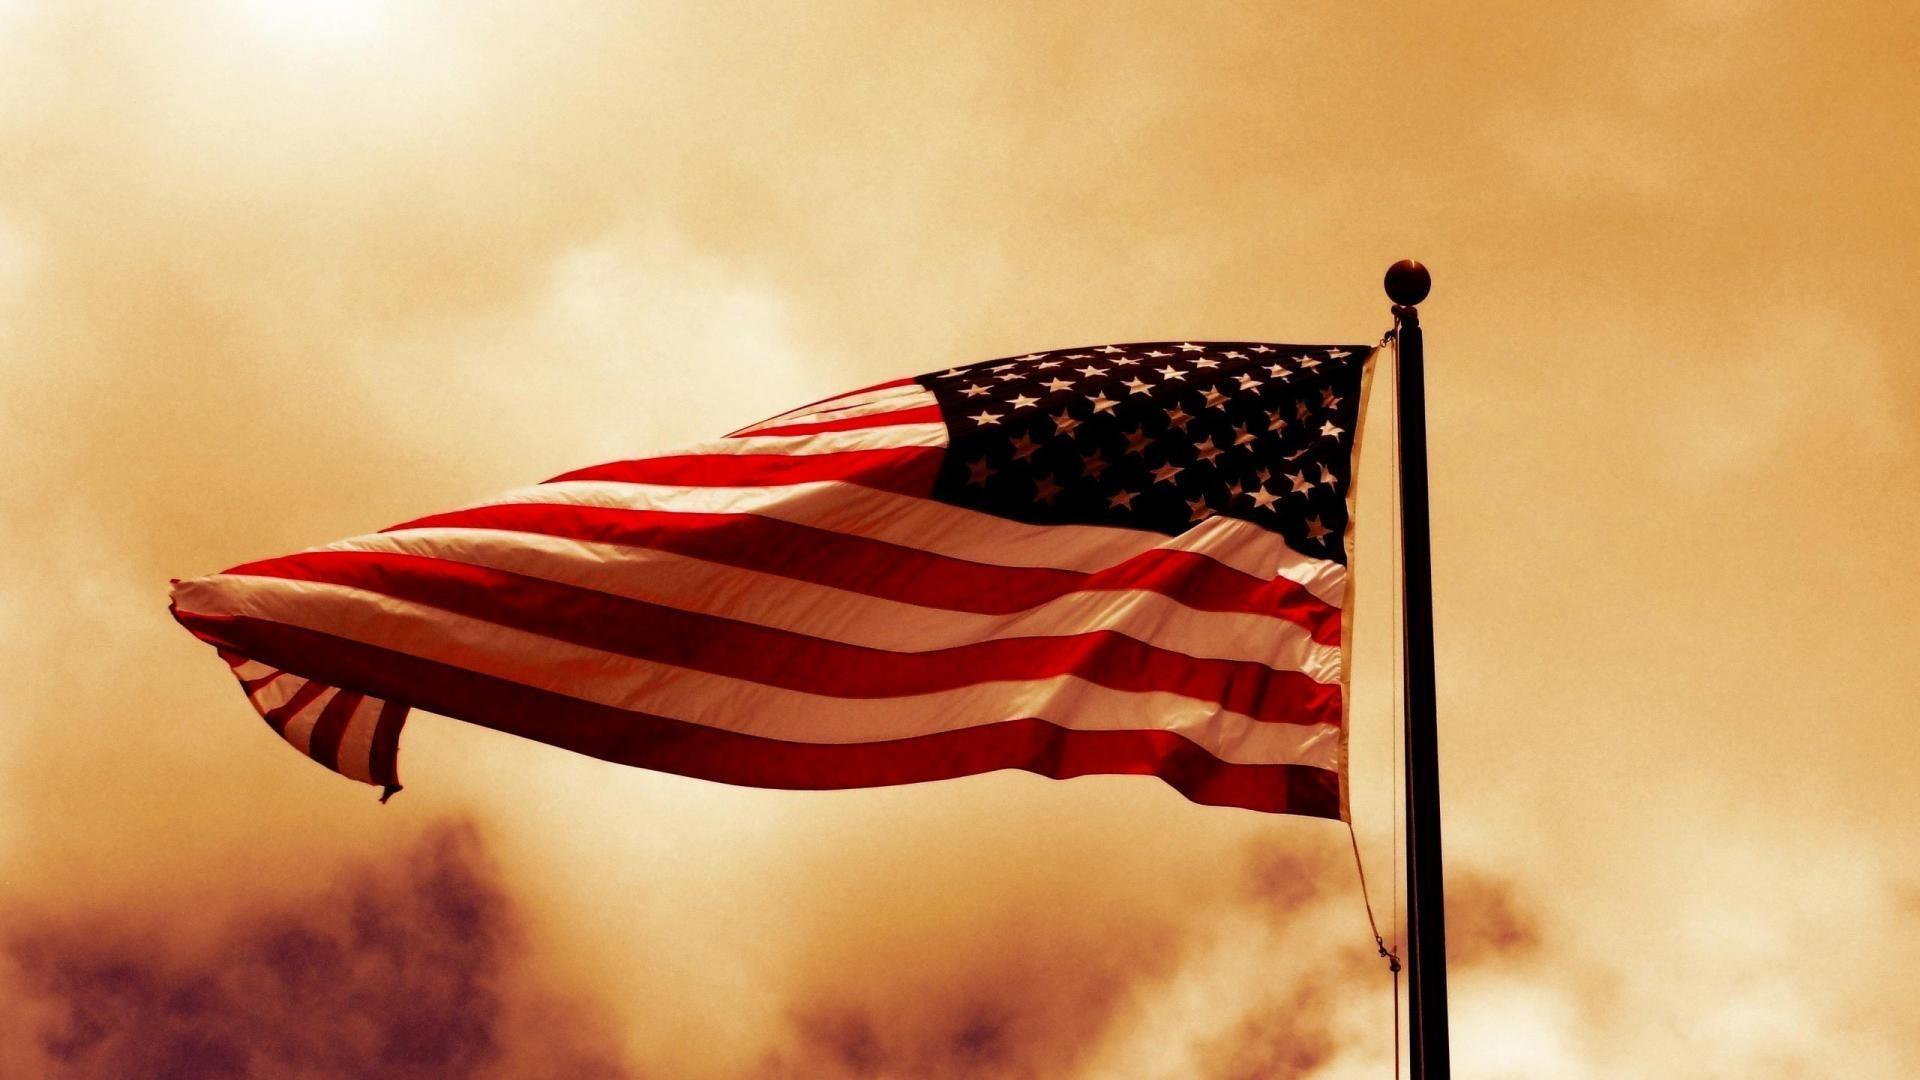 American Flag Wallpaper 1080p Â« Desktop Background Wallpapers HD